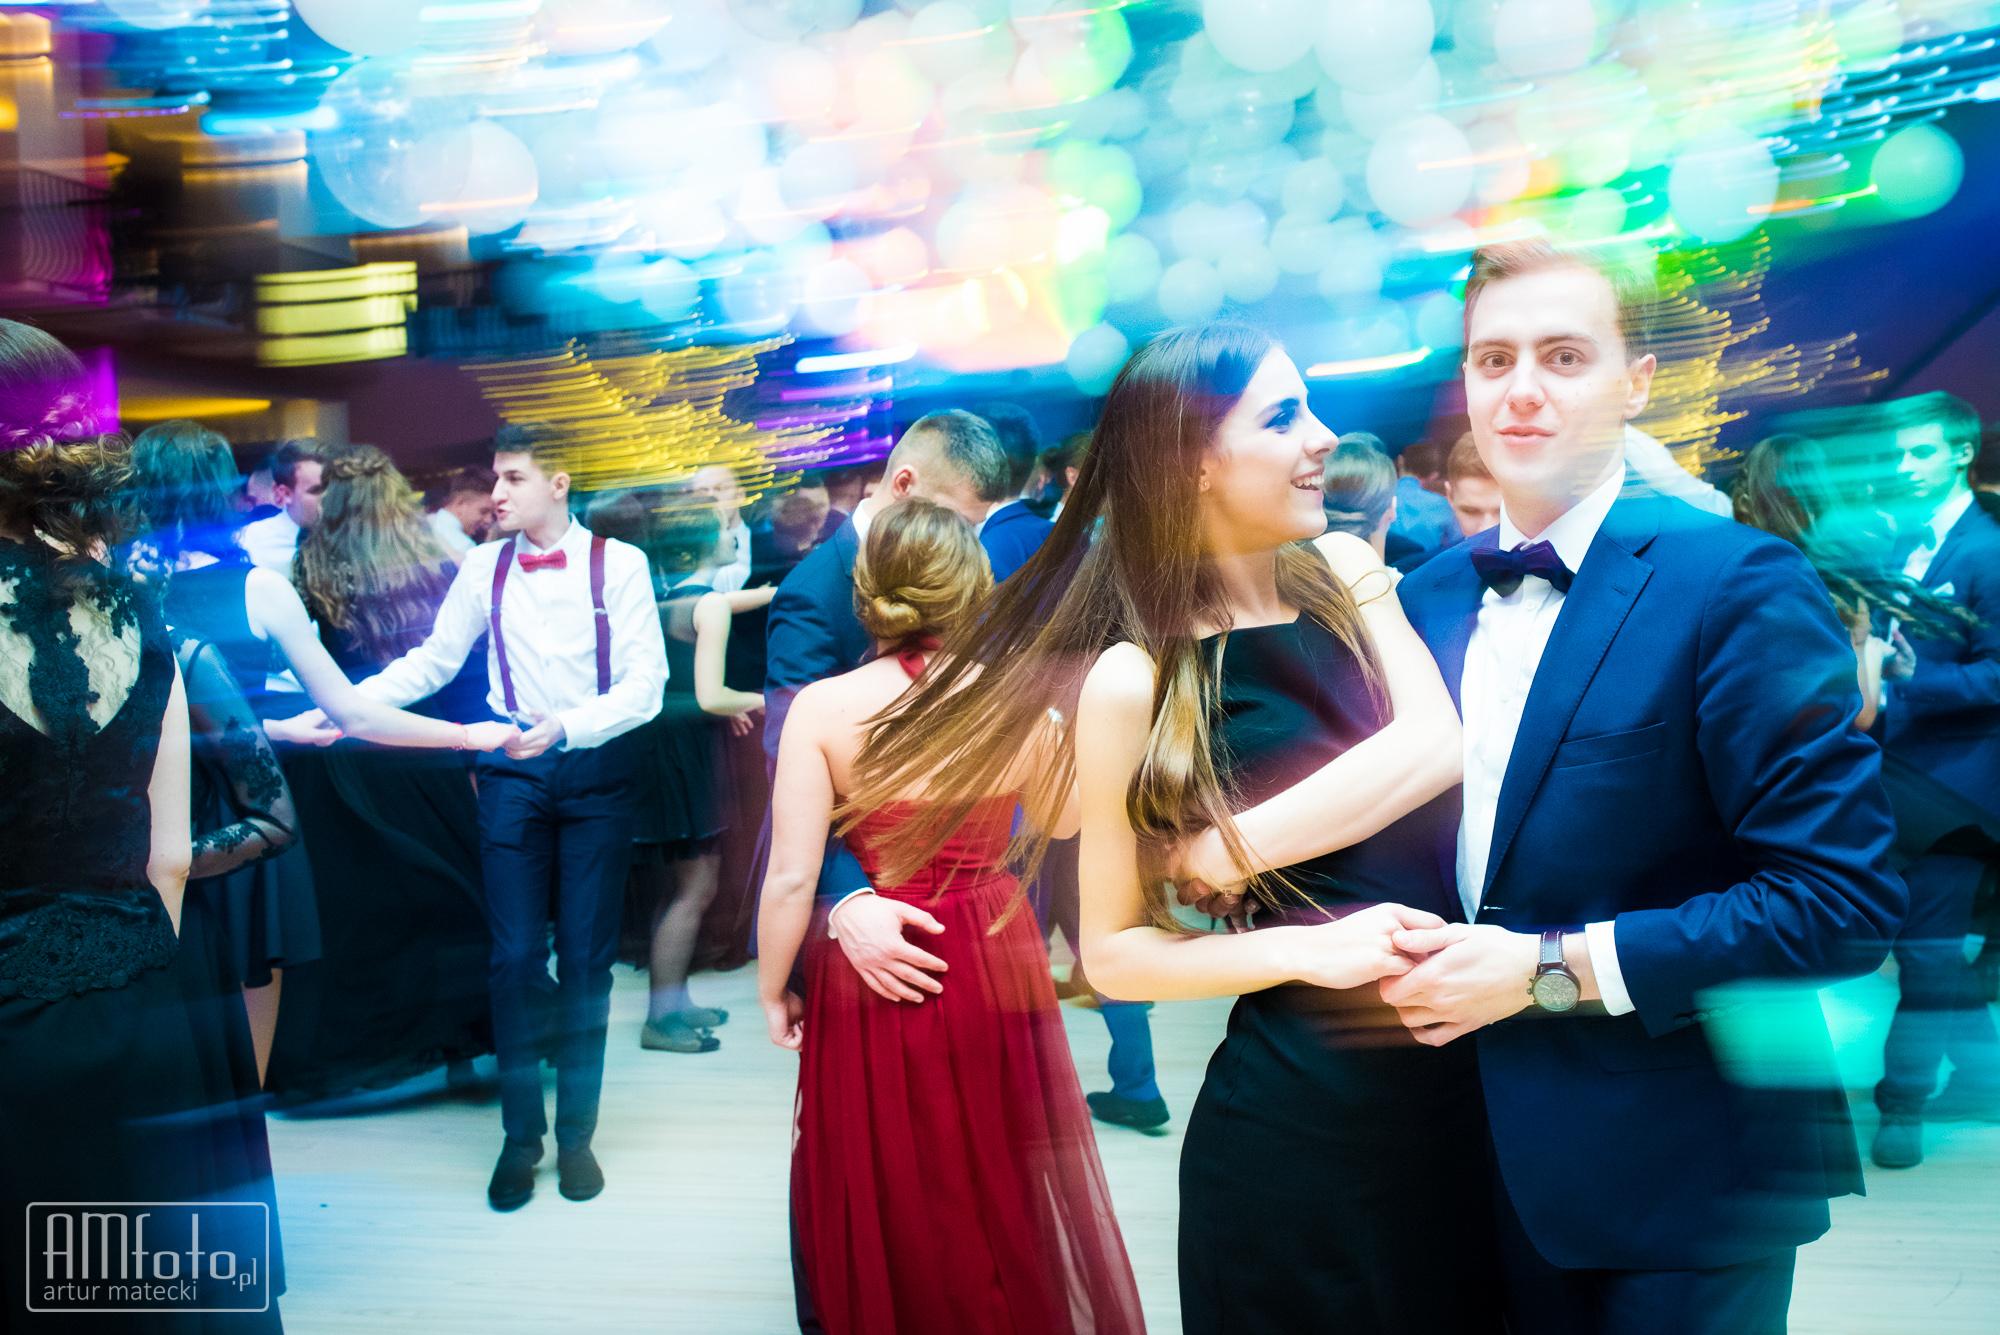 studniowka_2017_3LO_Kalisz_reportaz__www_amfoto_pl-1487.jpg